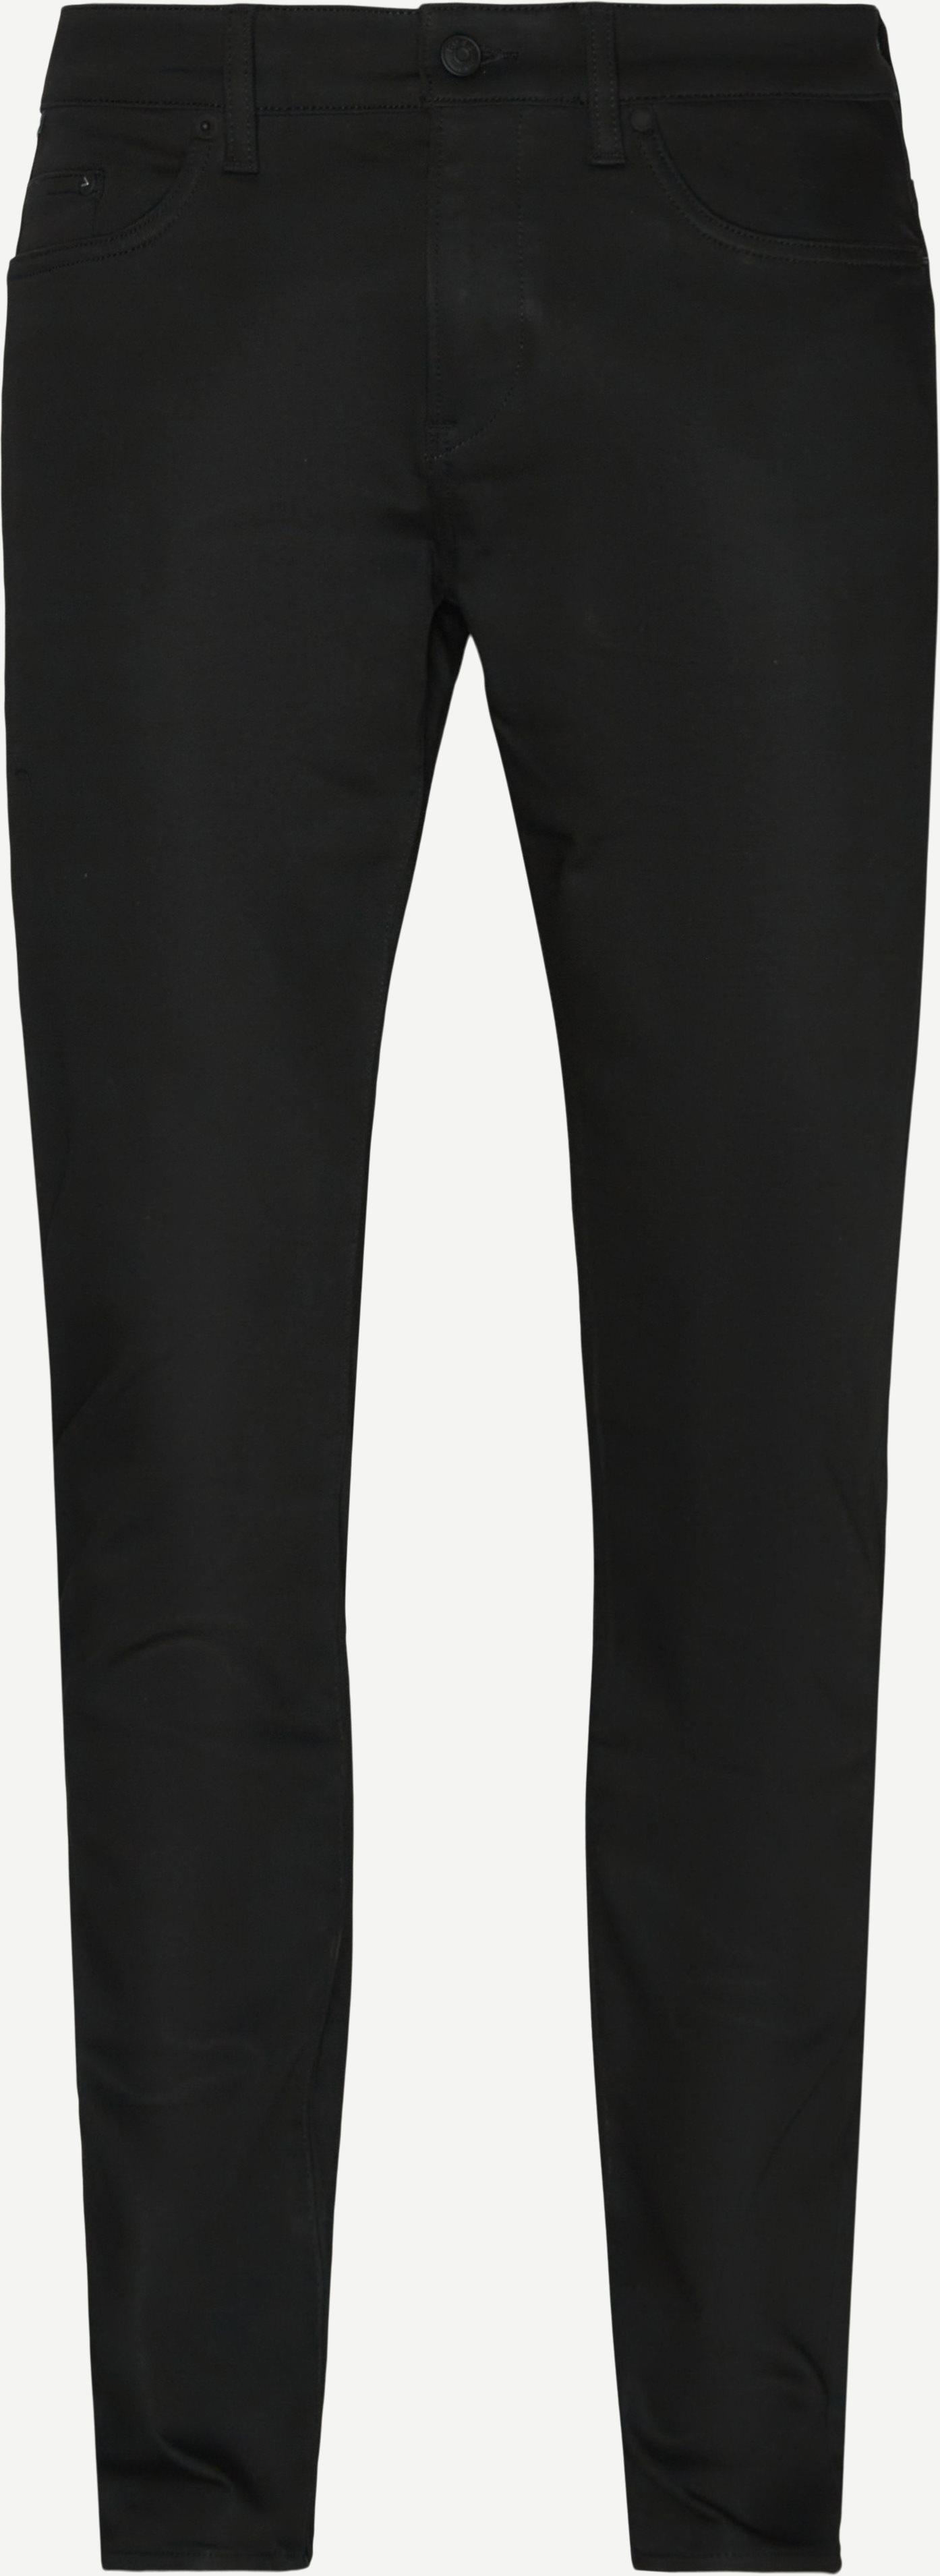 Jeans - Schwarz